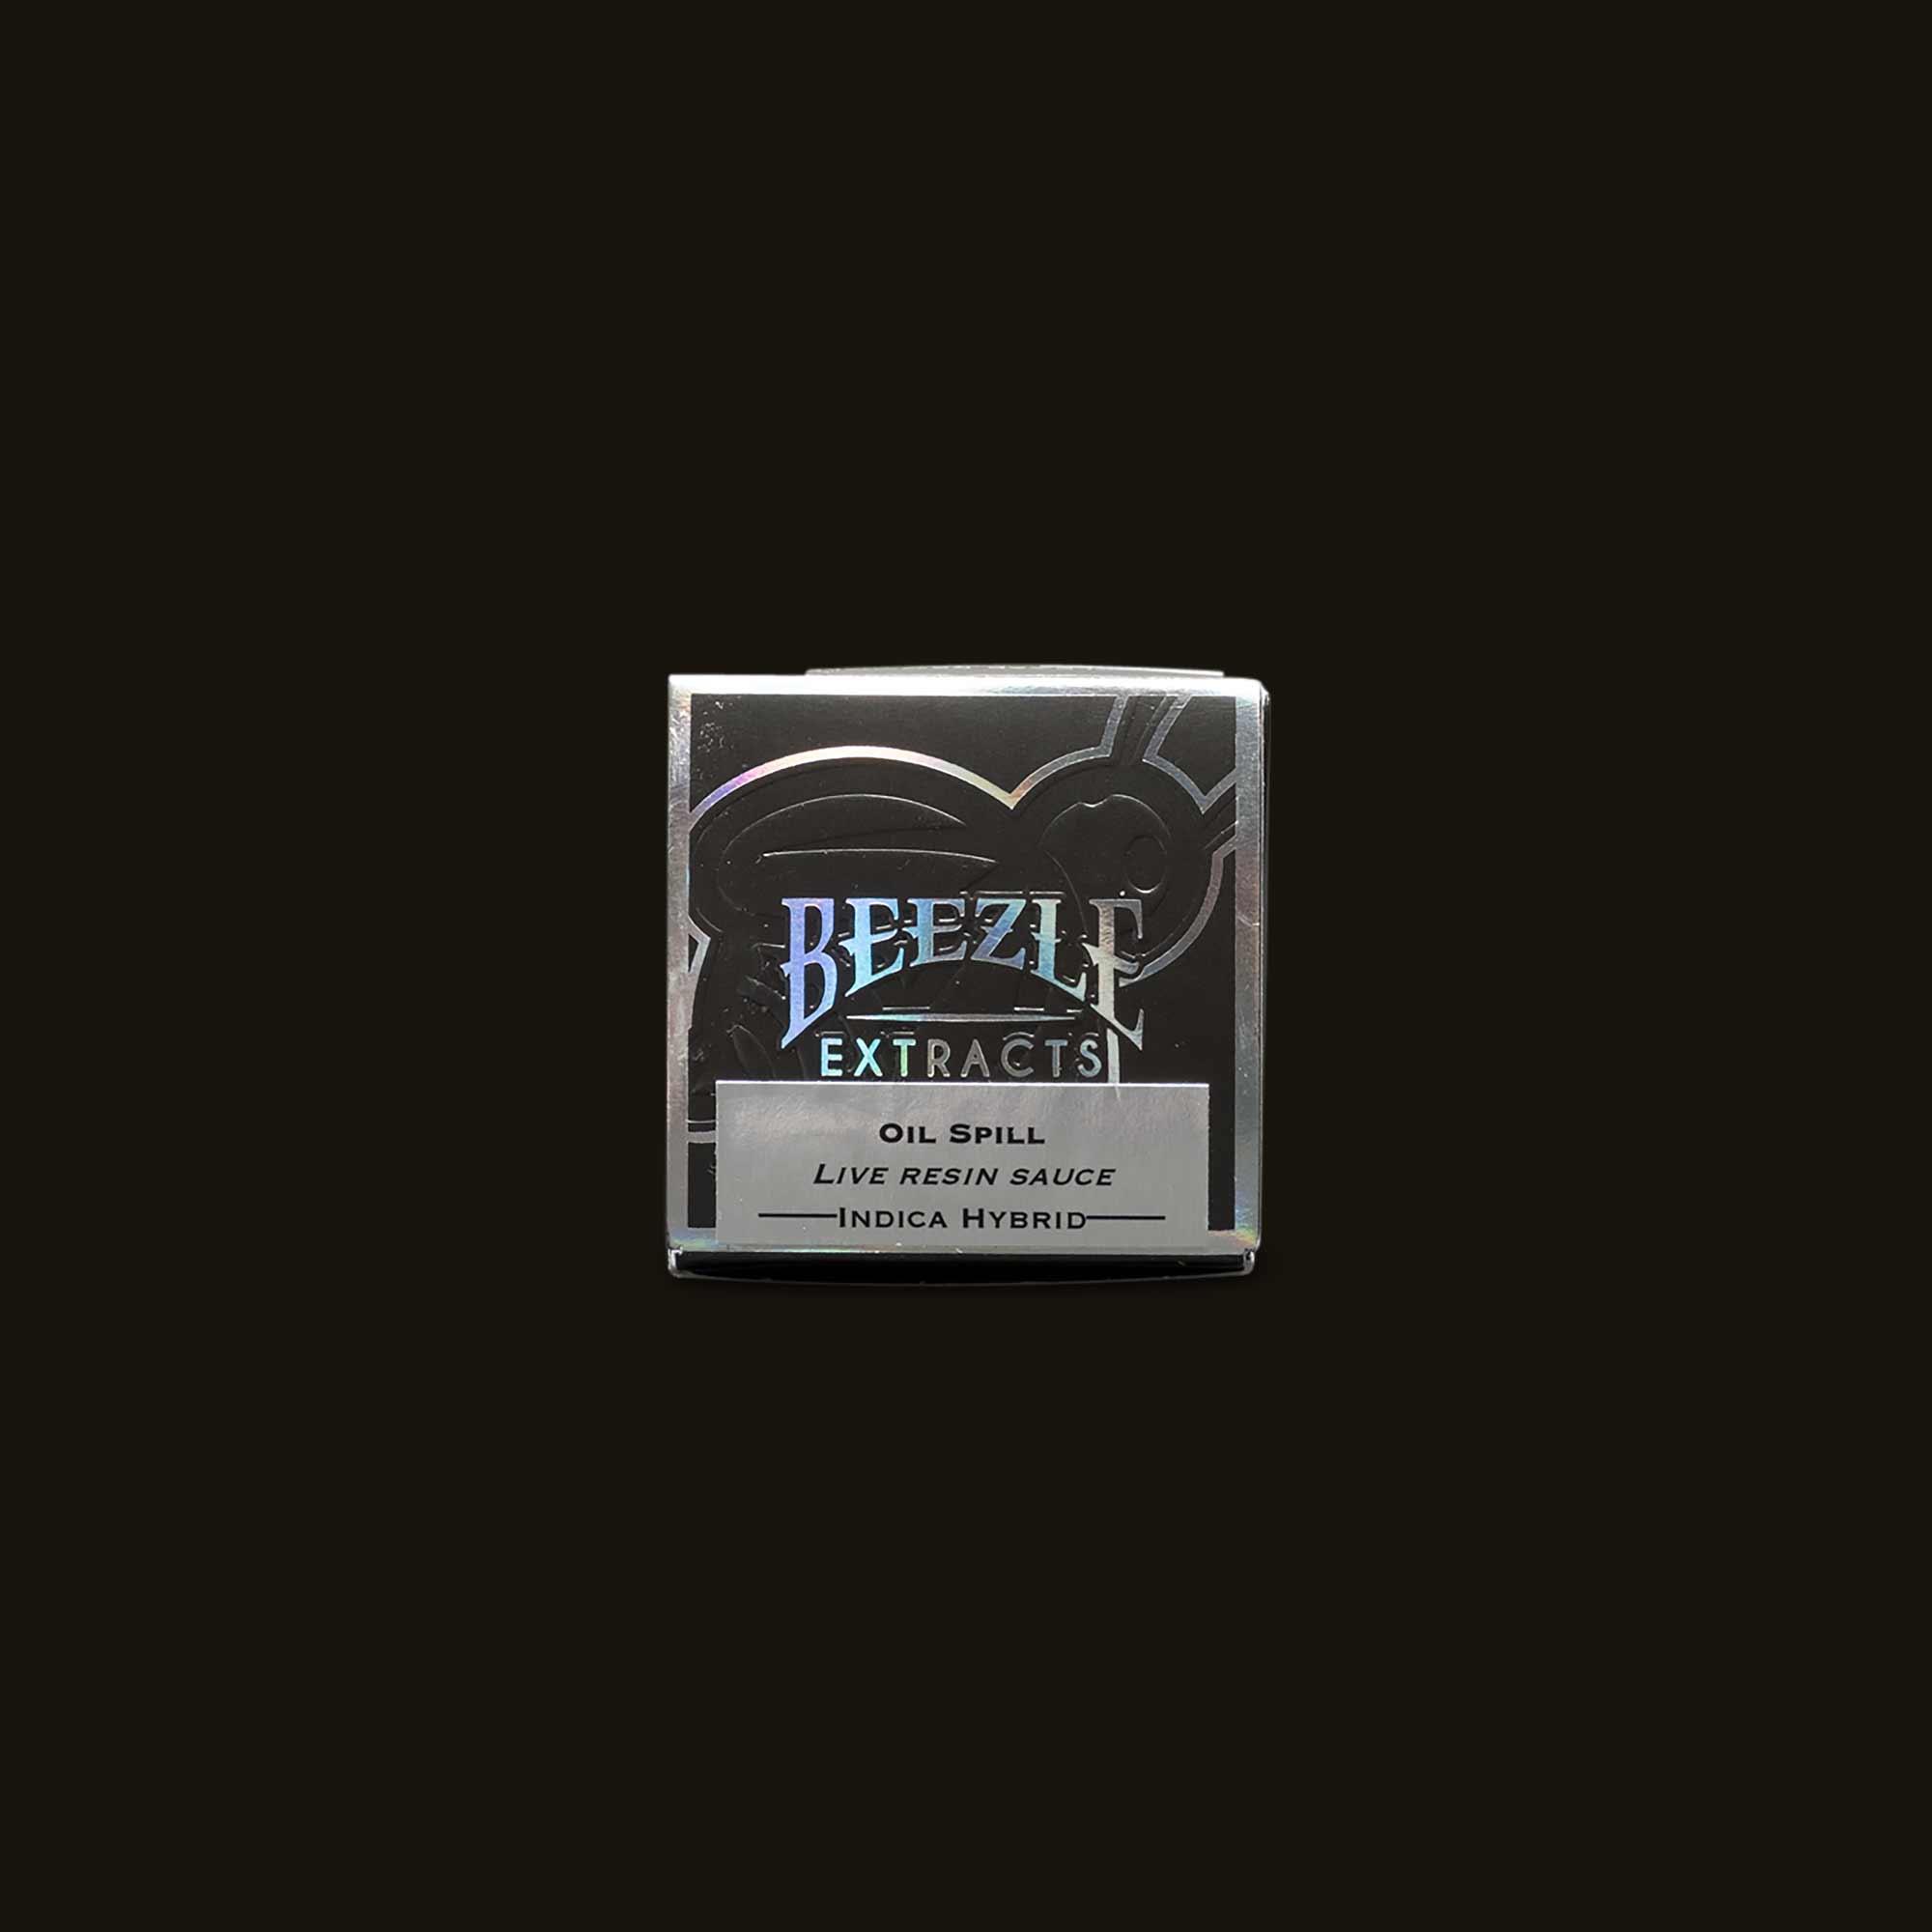 Beezle Oil Spill Live Resin Sauce